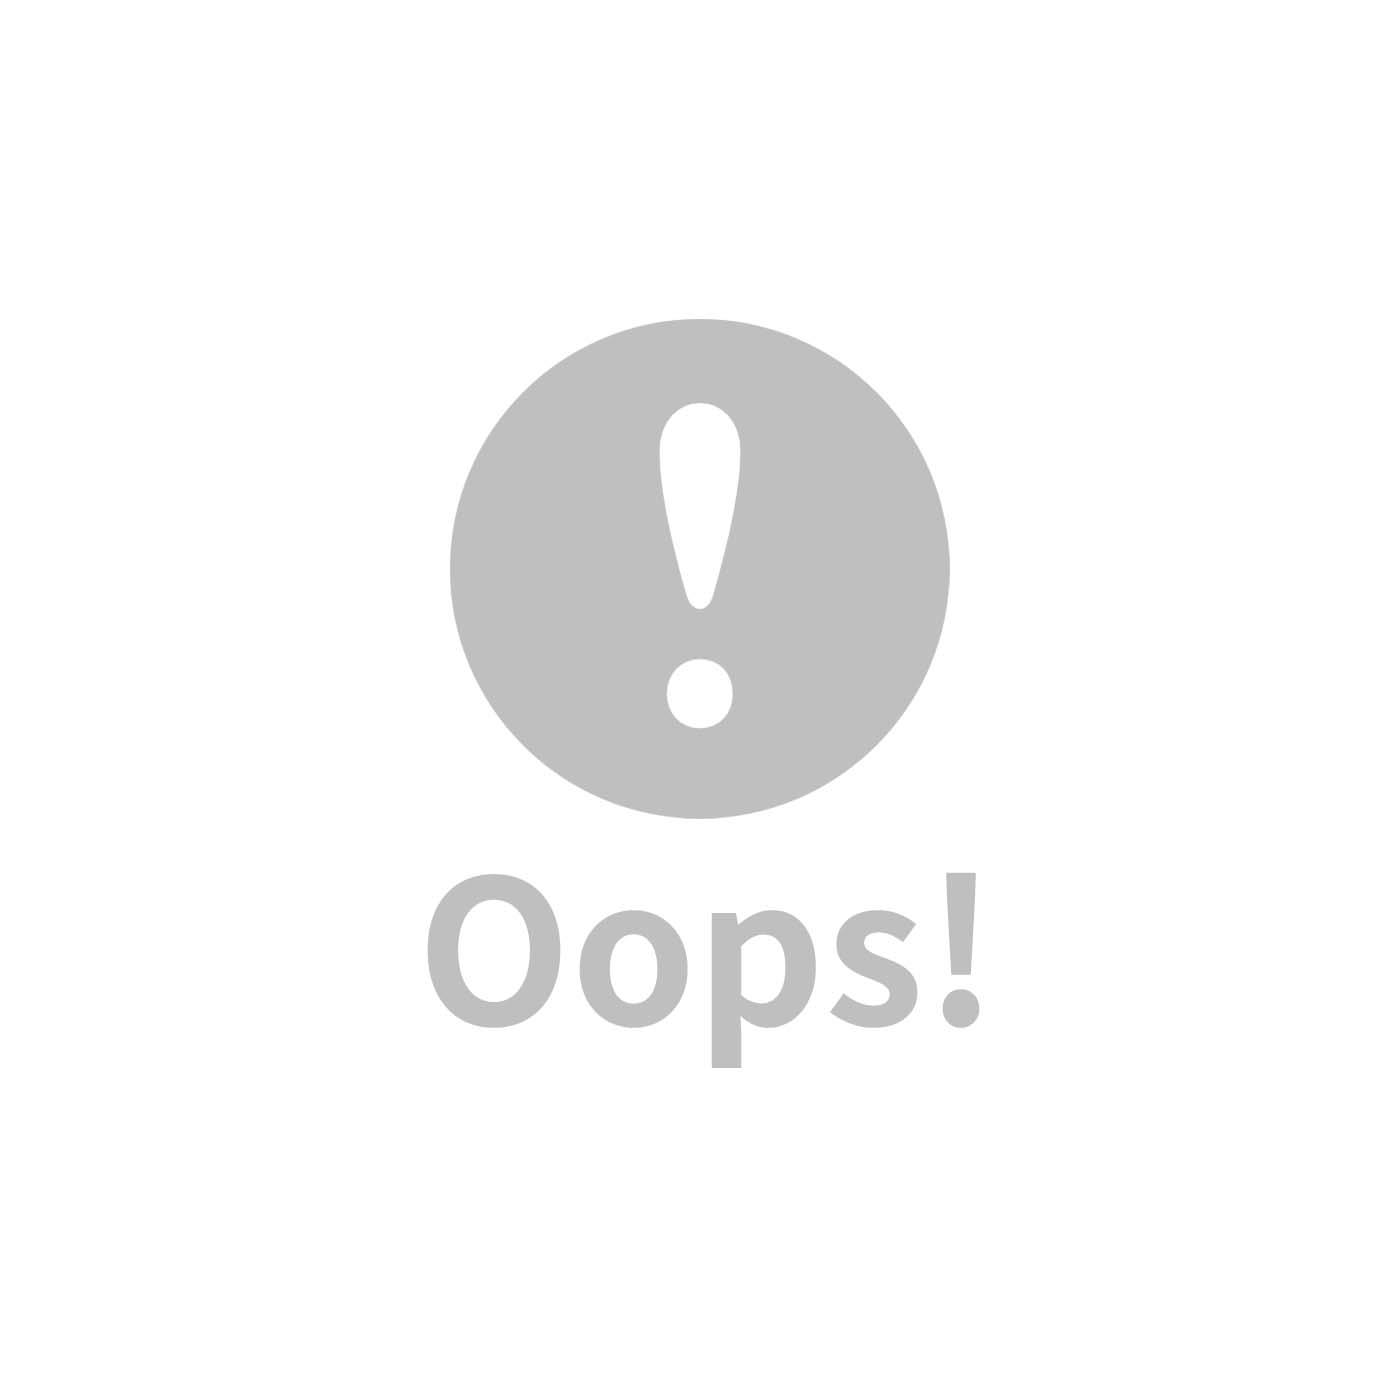 global affairs 童話手工編織安撫玩偶2(36cm)-小紅帽